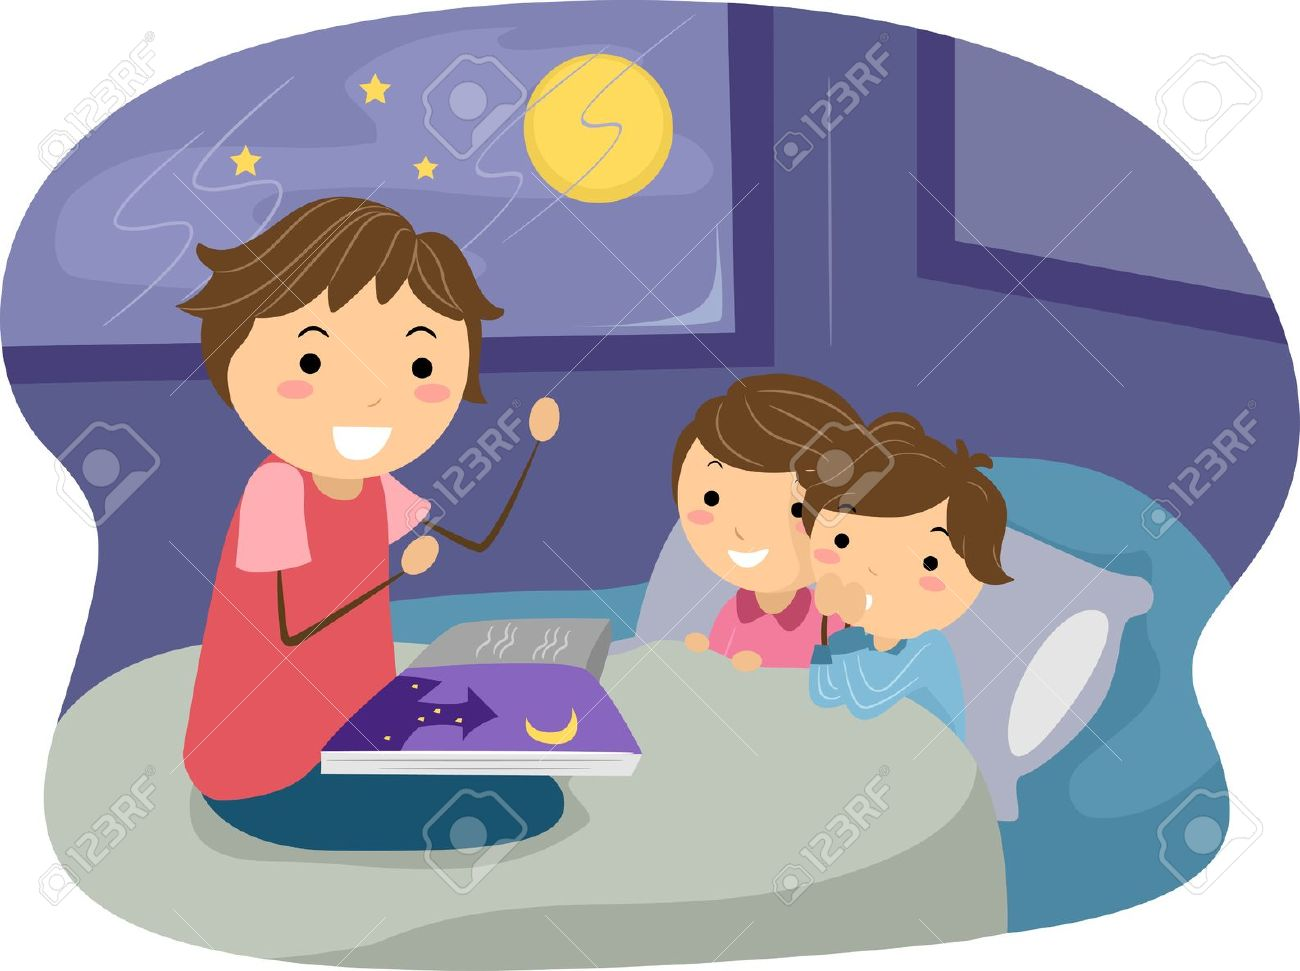 Illustration of Kids Listening to a Bedtime Story Stock Illustration - 13340406